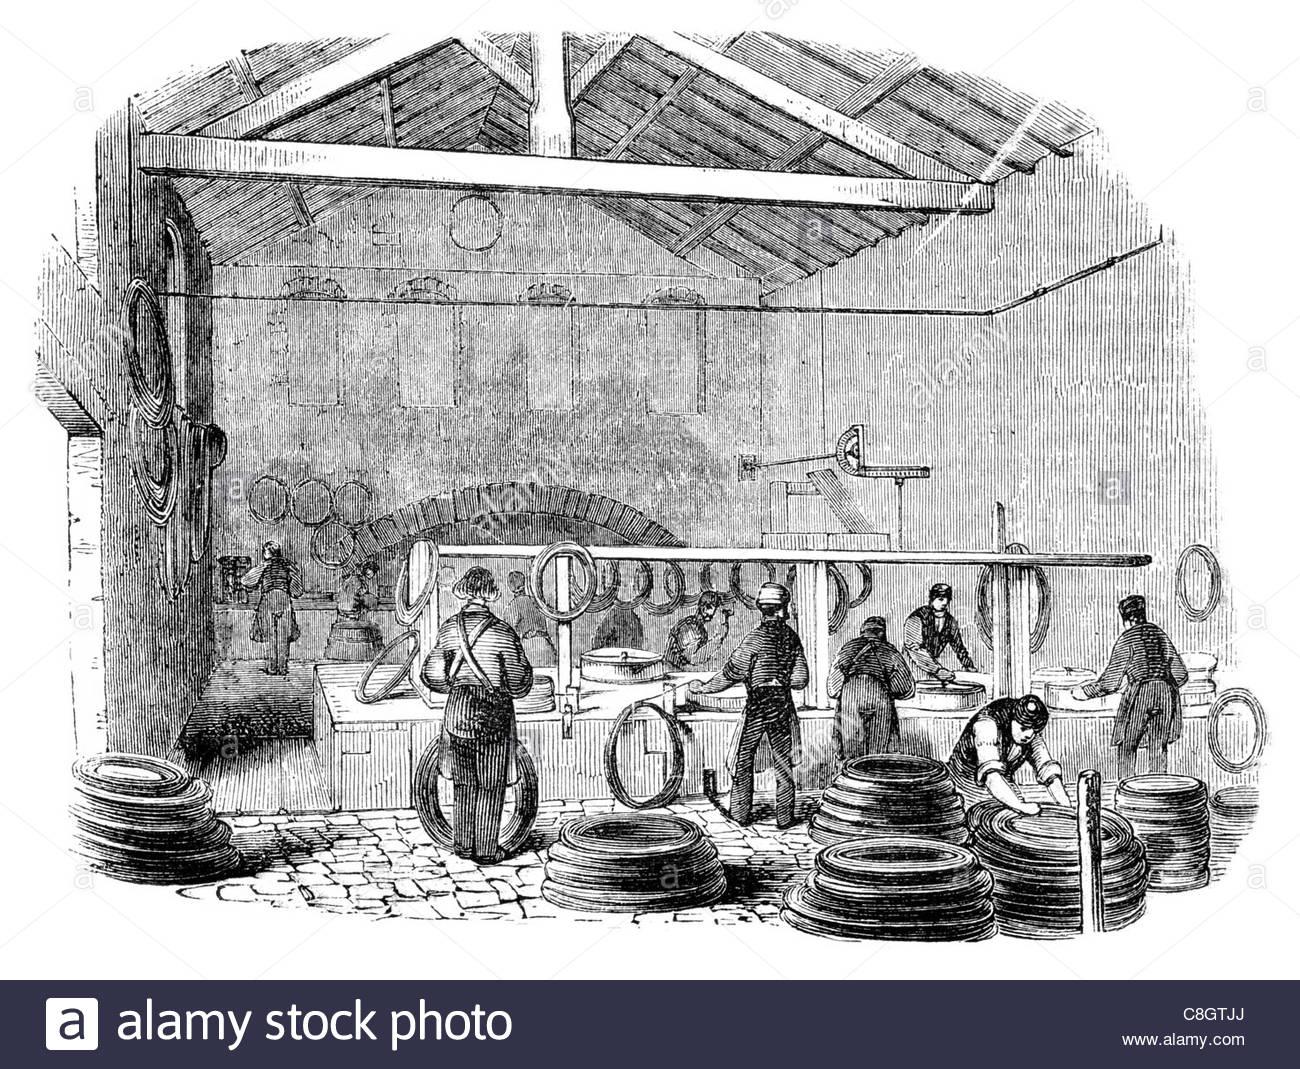 1300x1069 Wire Drawing Machines Industrial Revolution Machine Industry